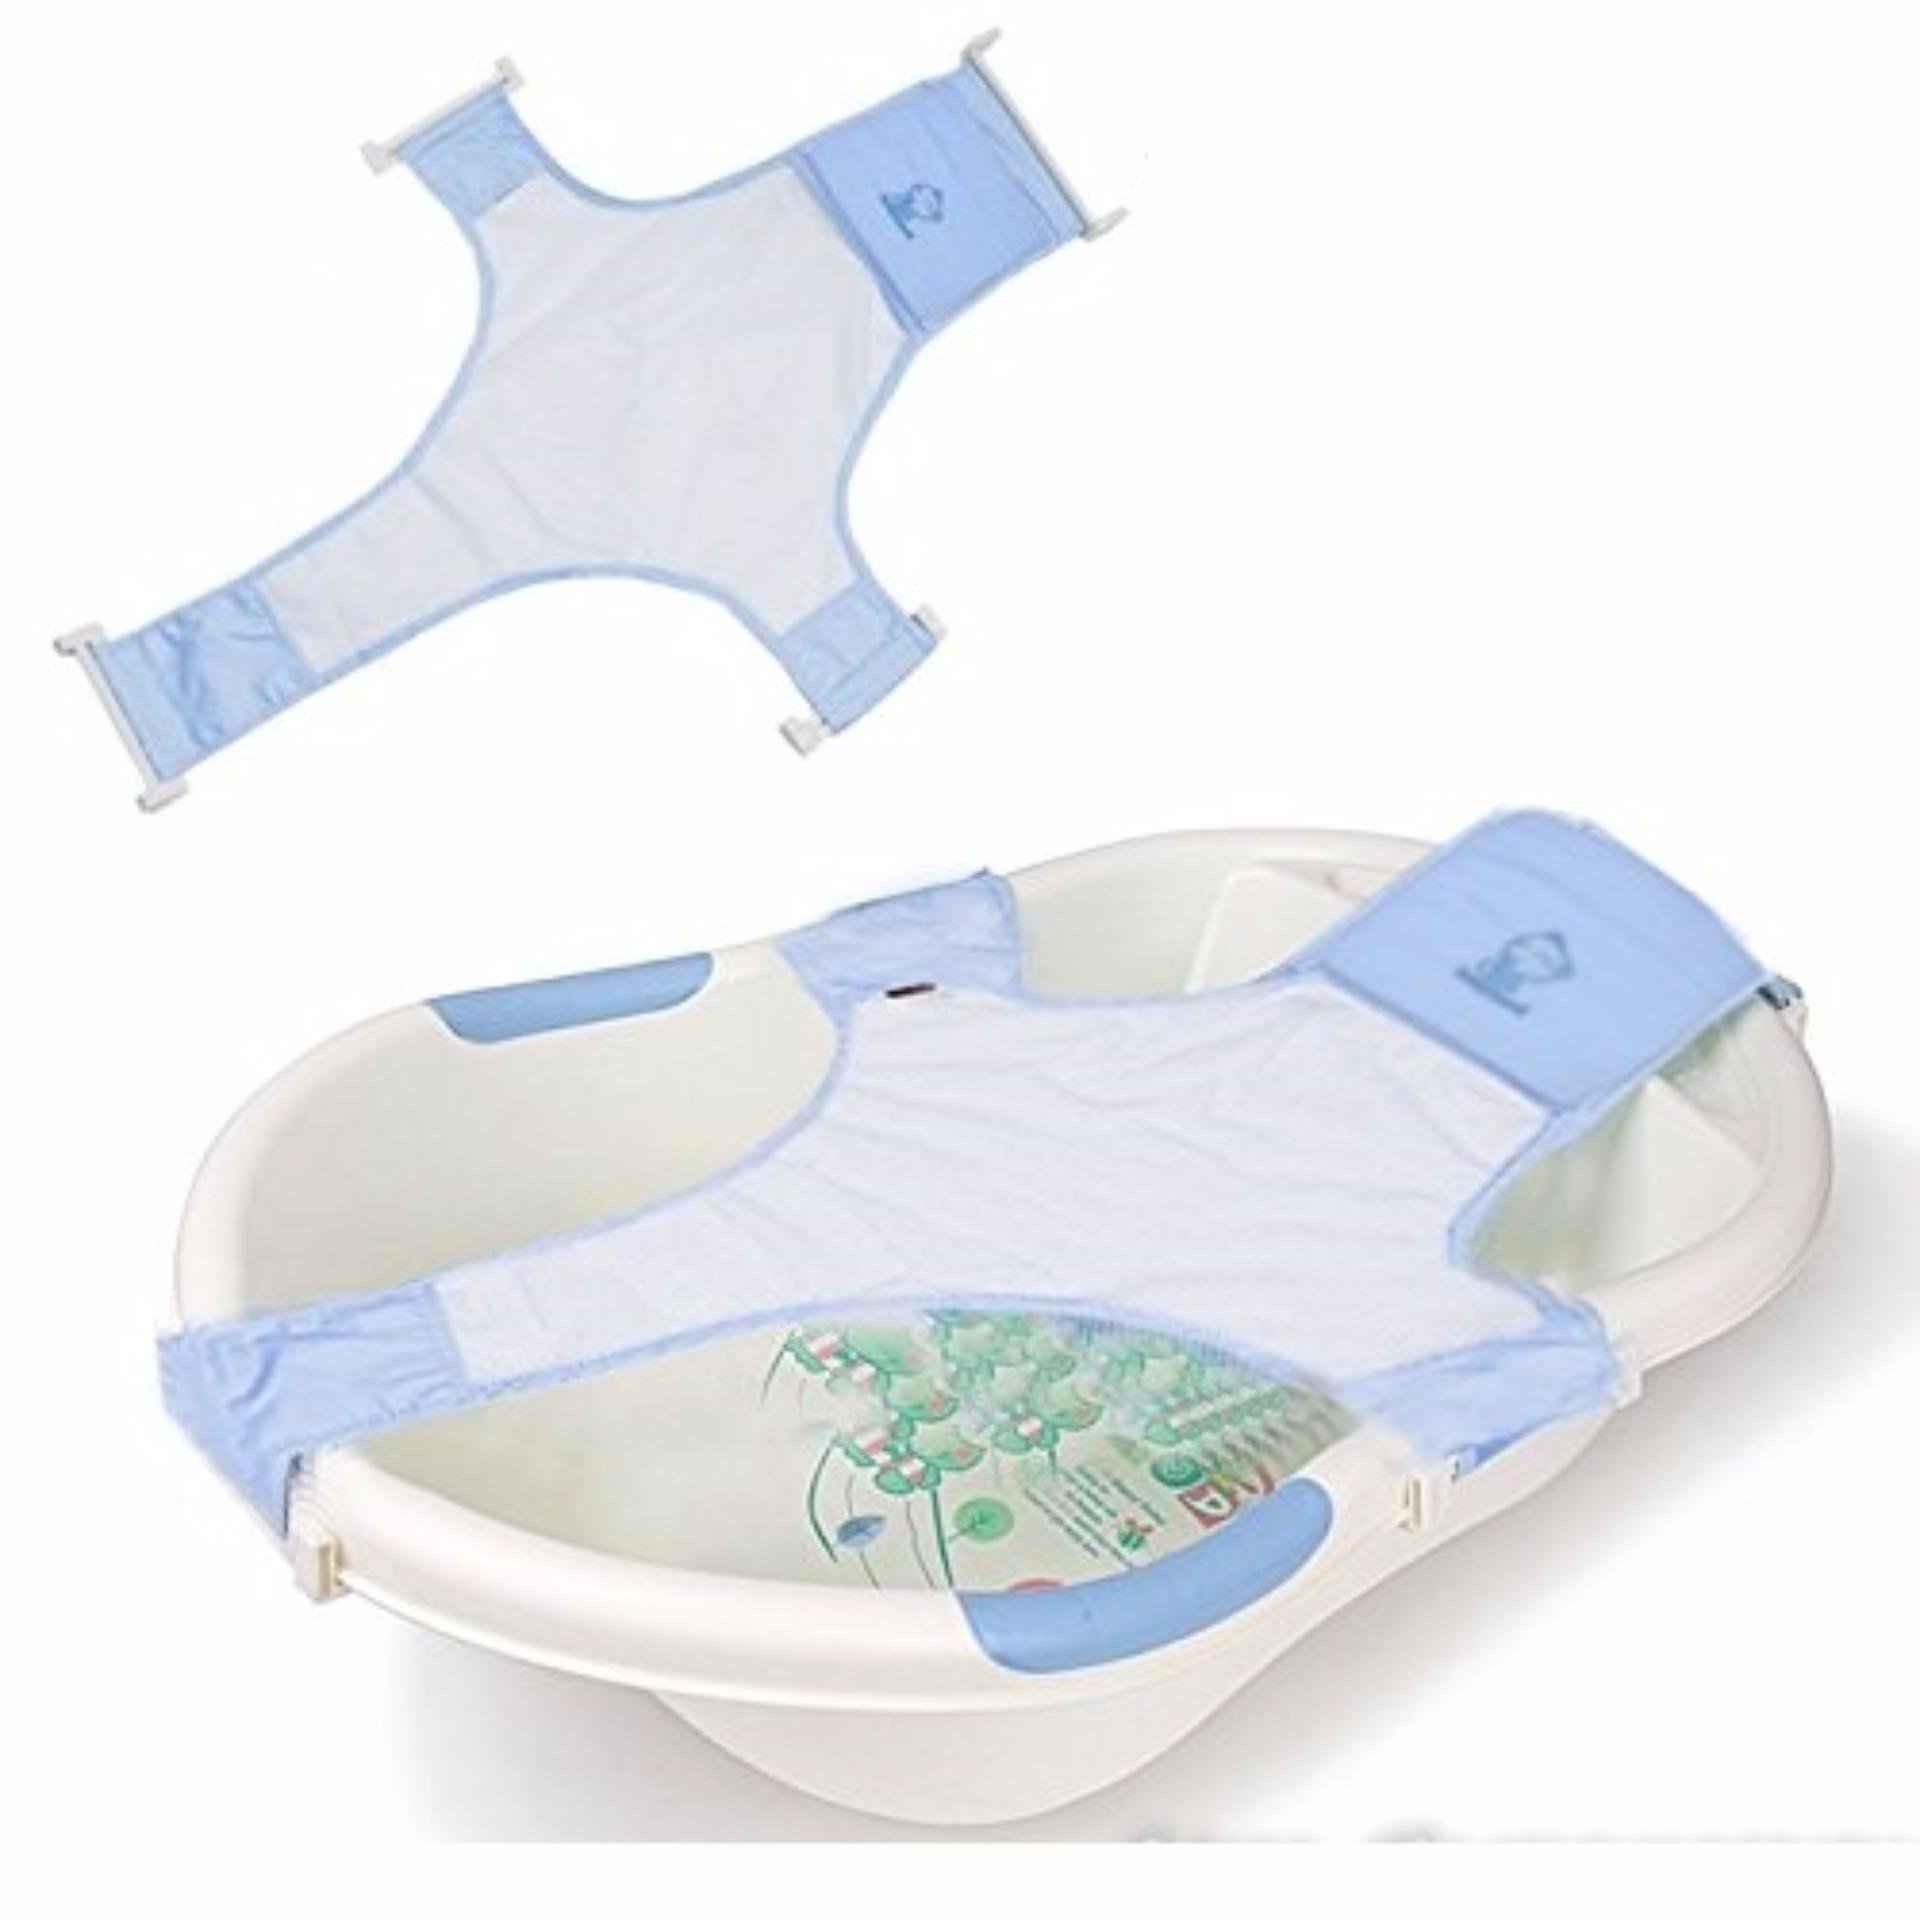 Philippines | Baby Bath Net - Adjustable Bathtub Support (Blue) The ...